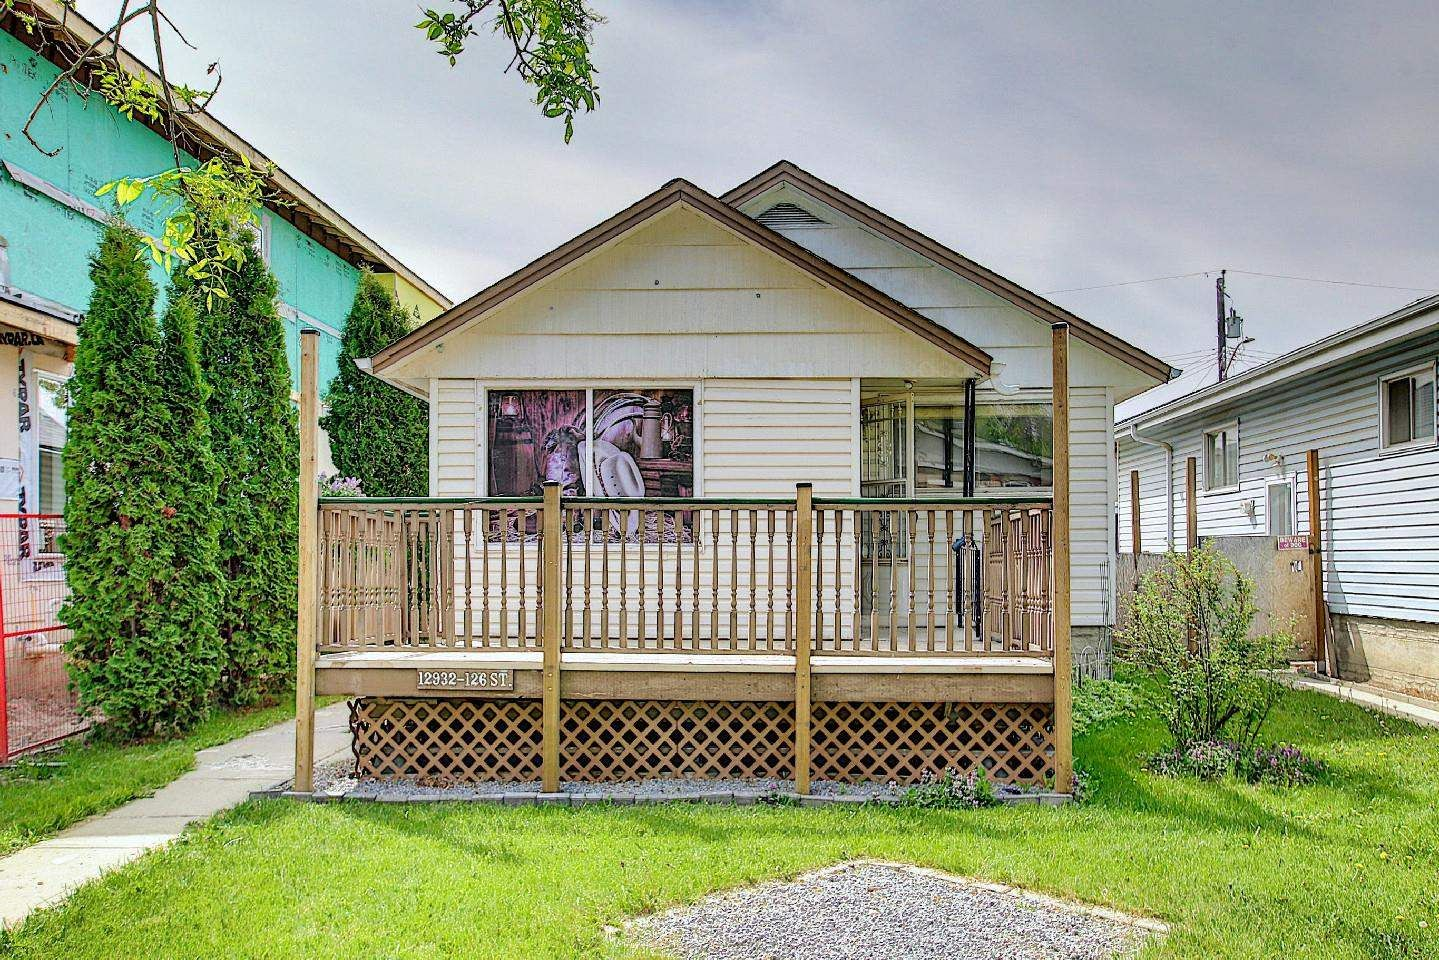 Main Photo: 12932 126 Street in Edmonton: Zone 01 House for sale : MLS®# E4247489